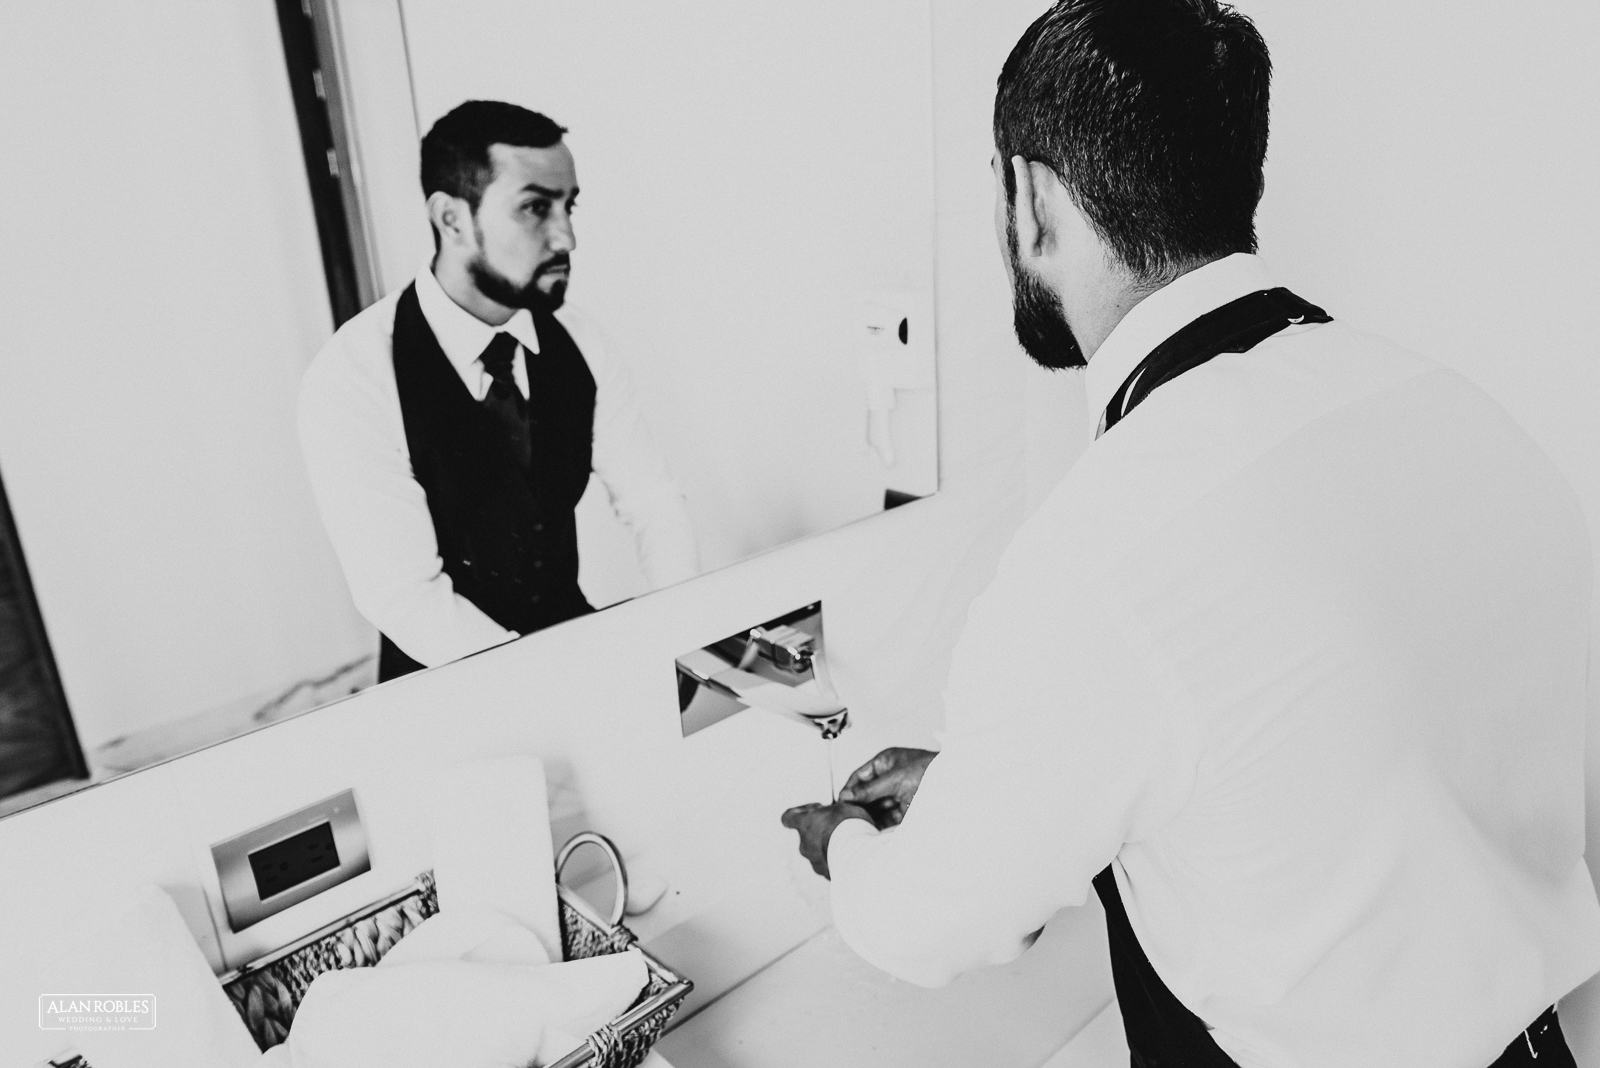 Fotografo de bodas Alan Robles-Boda en Guadalajara Real San Javier-19